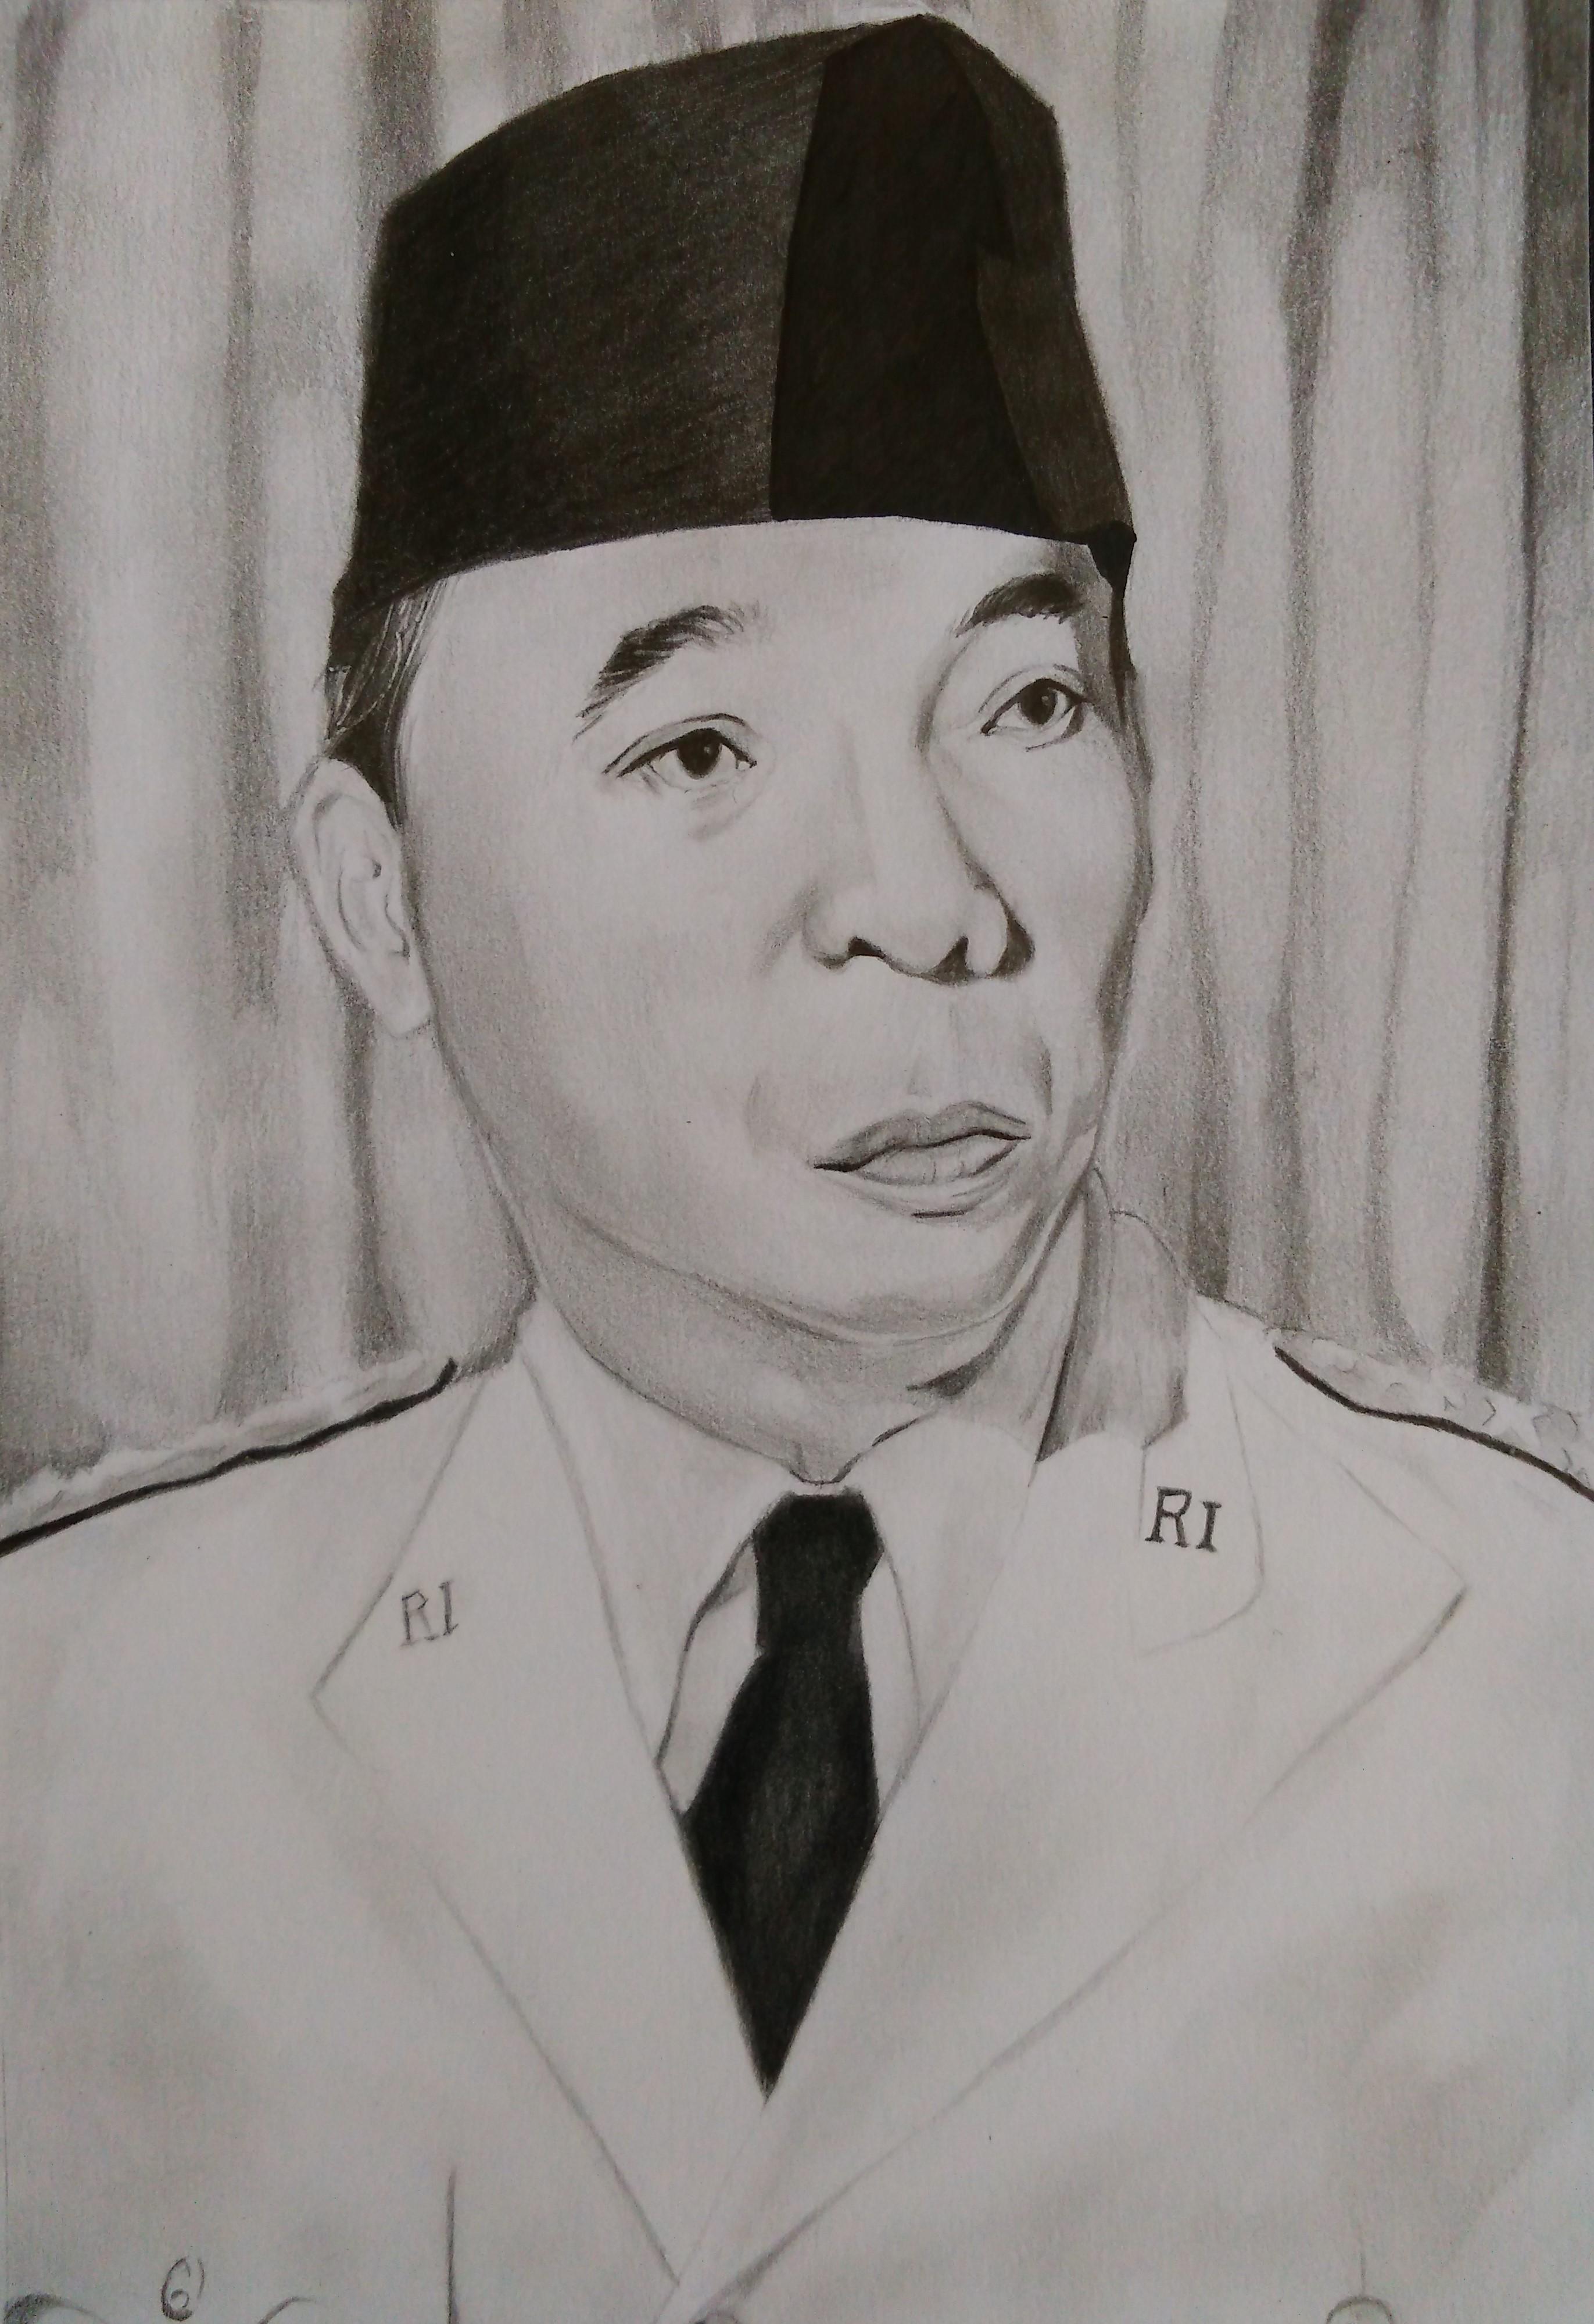 Ir Soekarno Presiden No 1 Indonesia By Seijiwan On Deviantart